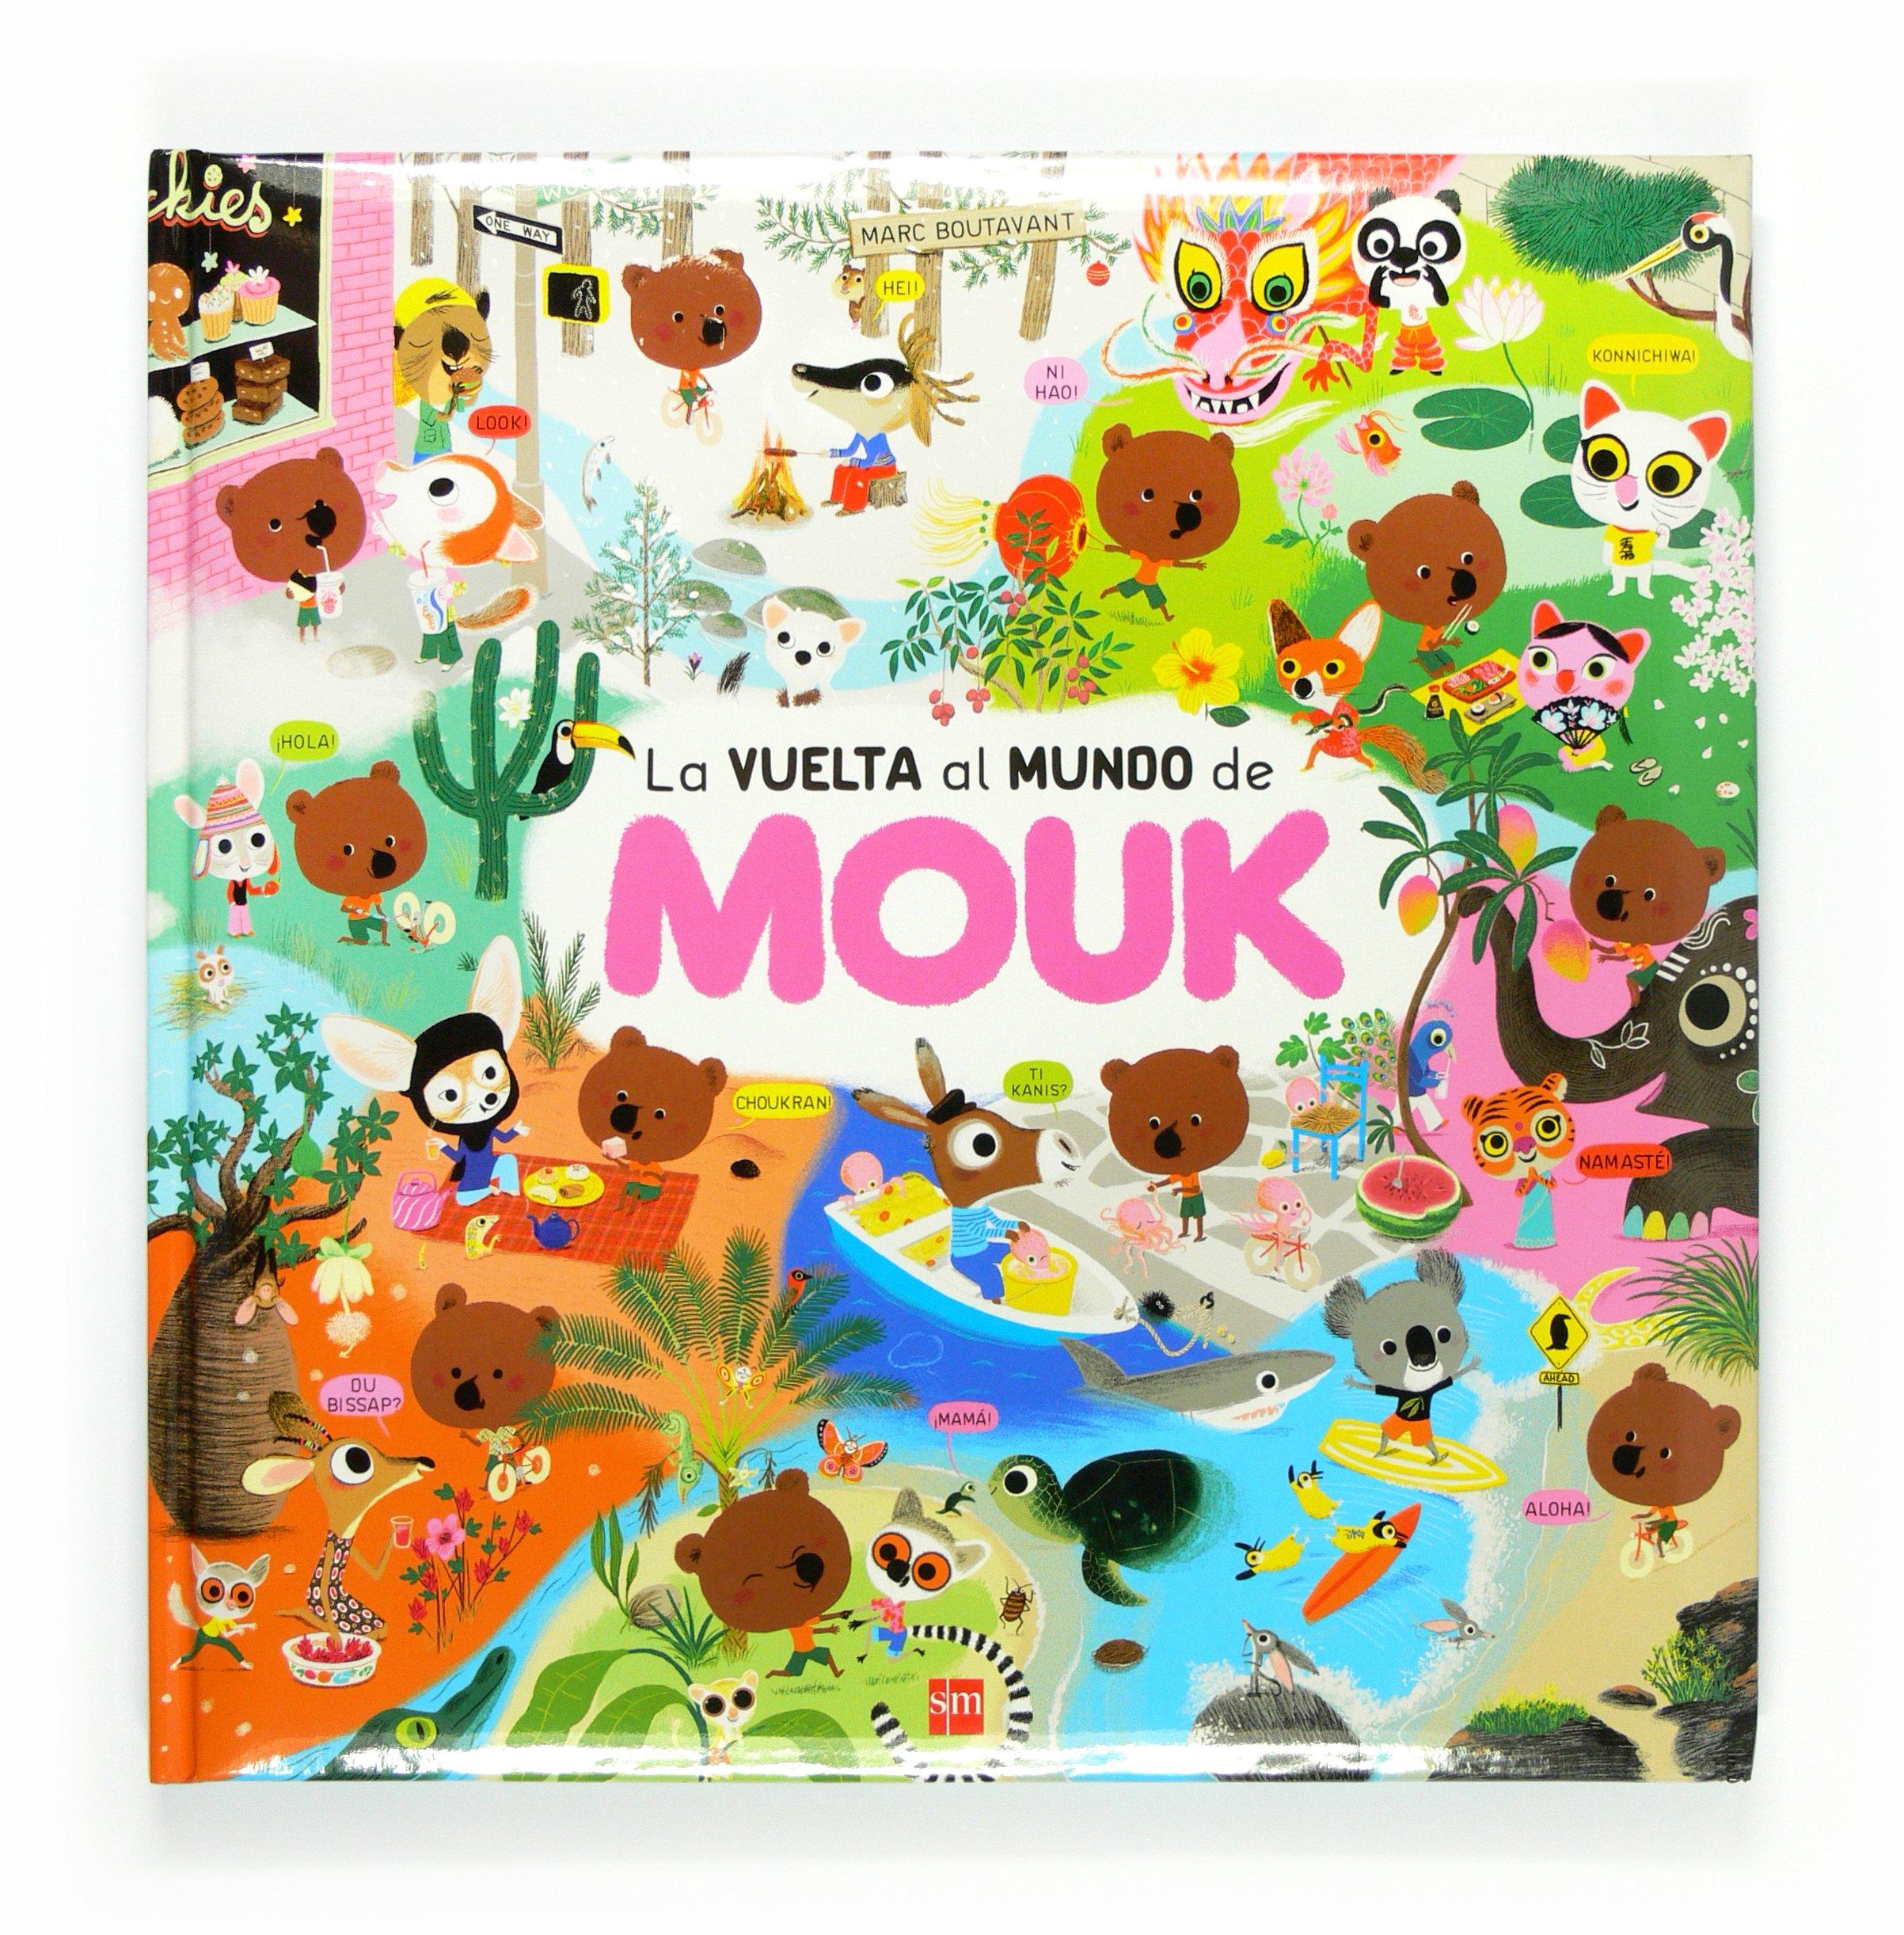 La vuelta al mundo de Mouk: Amazon.es: Boutavant, Marc, Boutavant ...